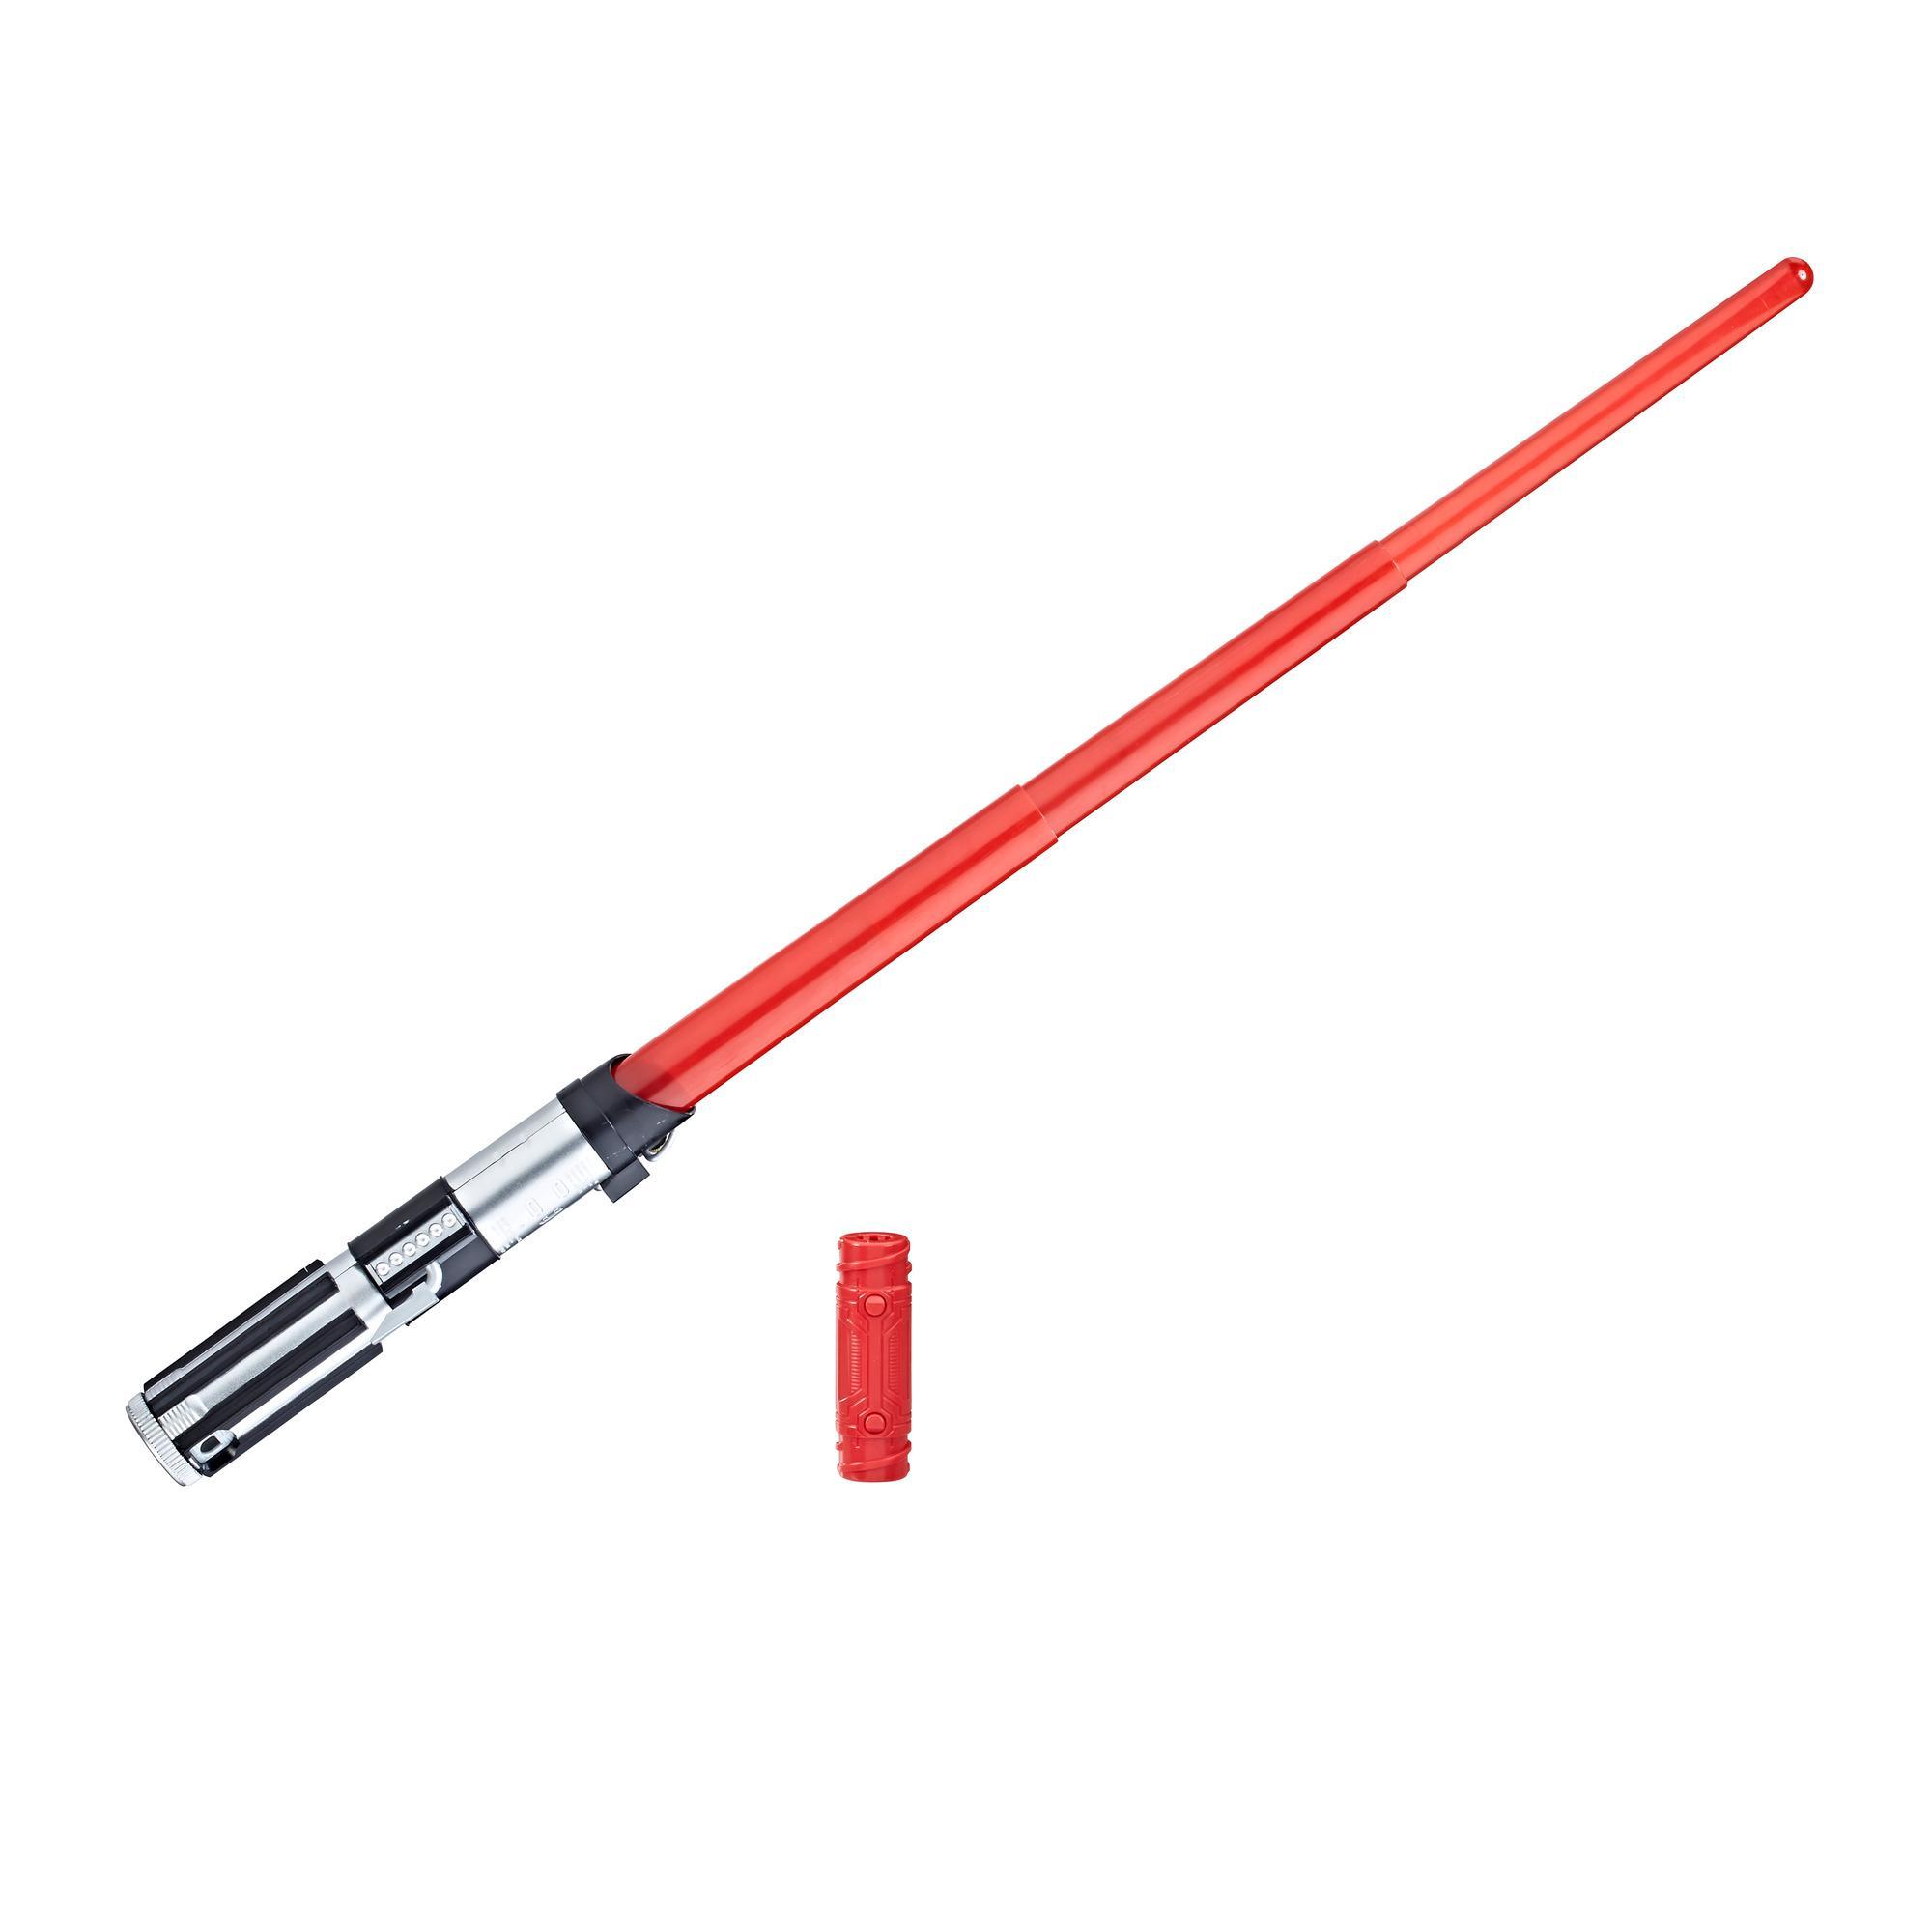 Star Wars: A New Hope Darth Vader Electronic Lightsaber